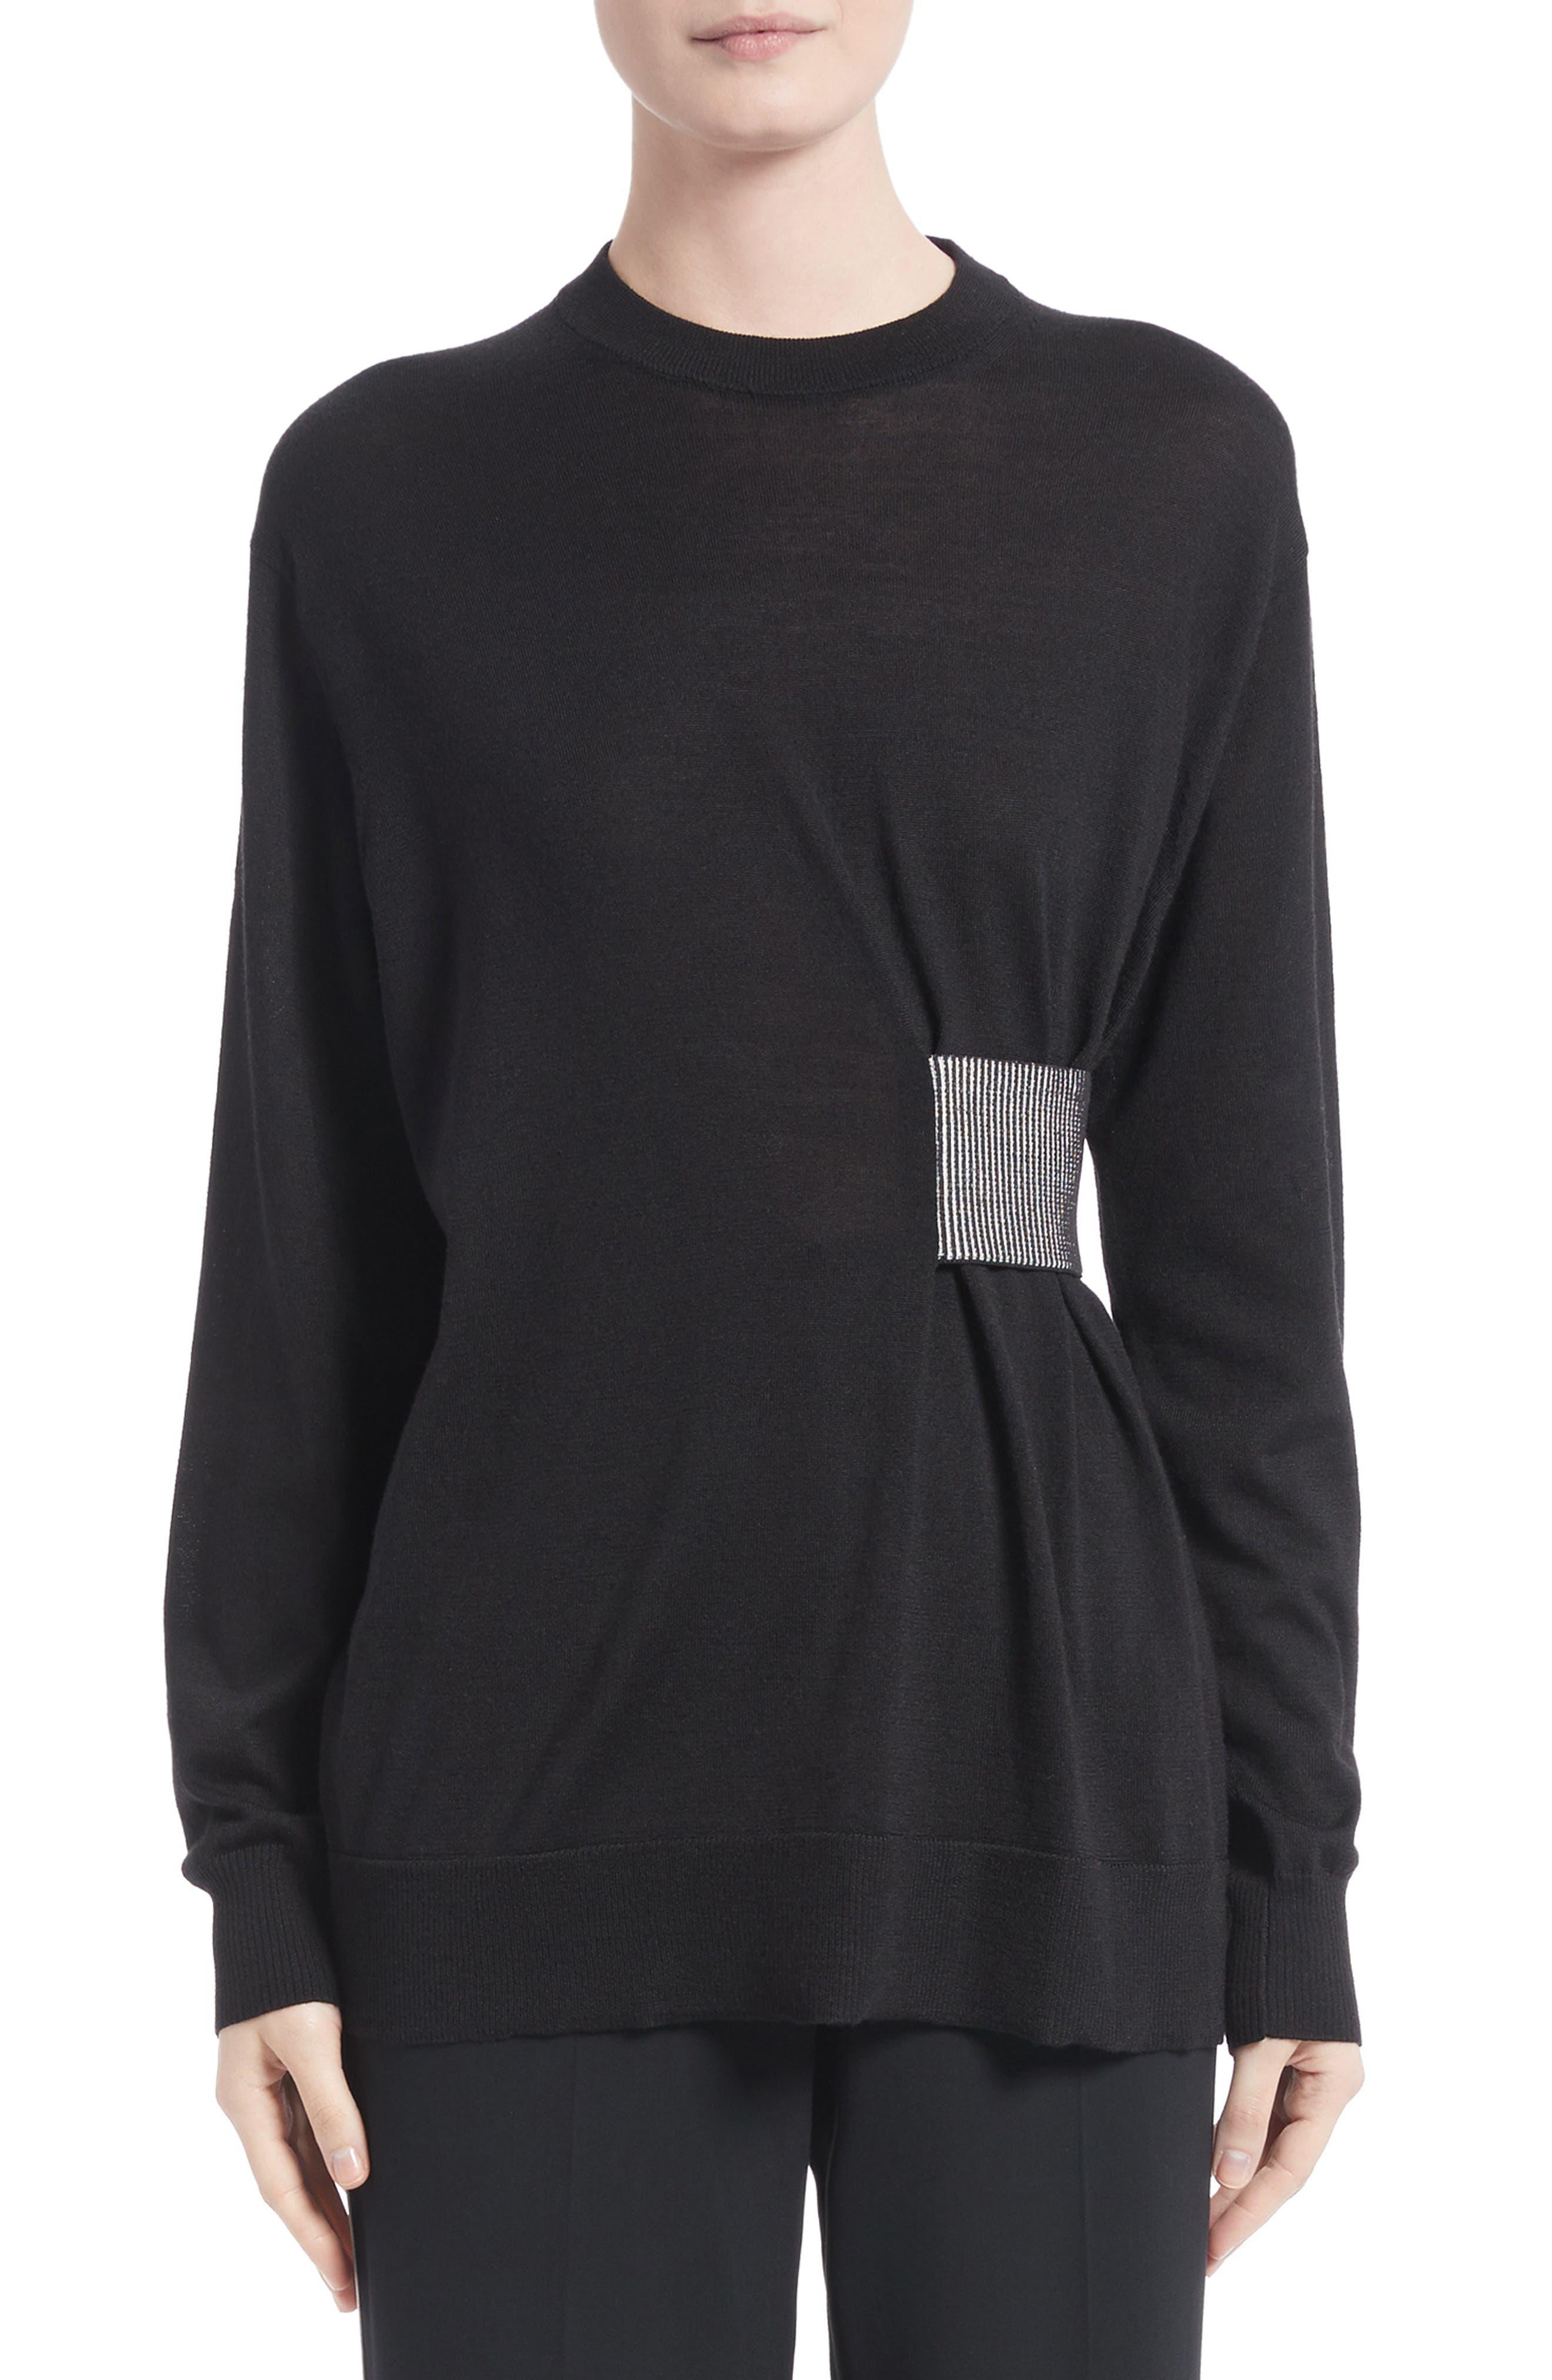 Proenza Schouler Clinch Detail Sweater